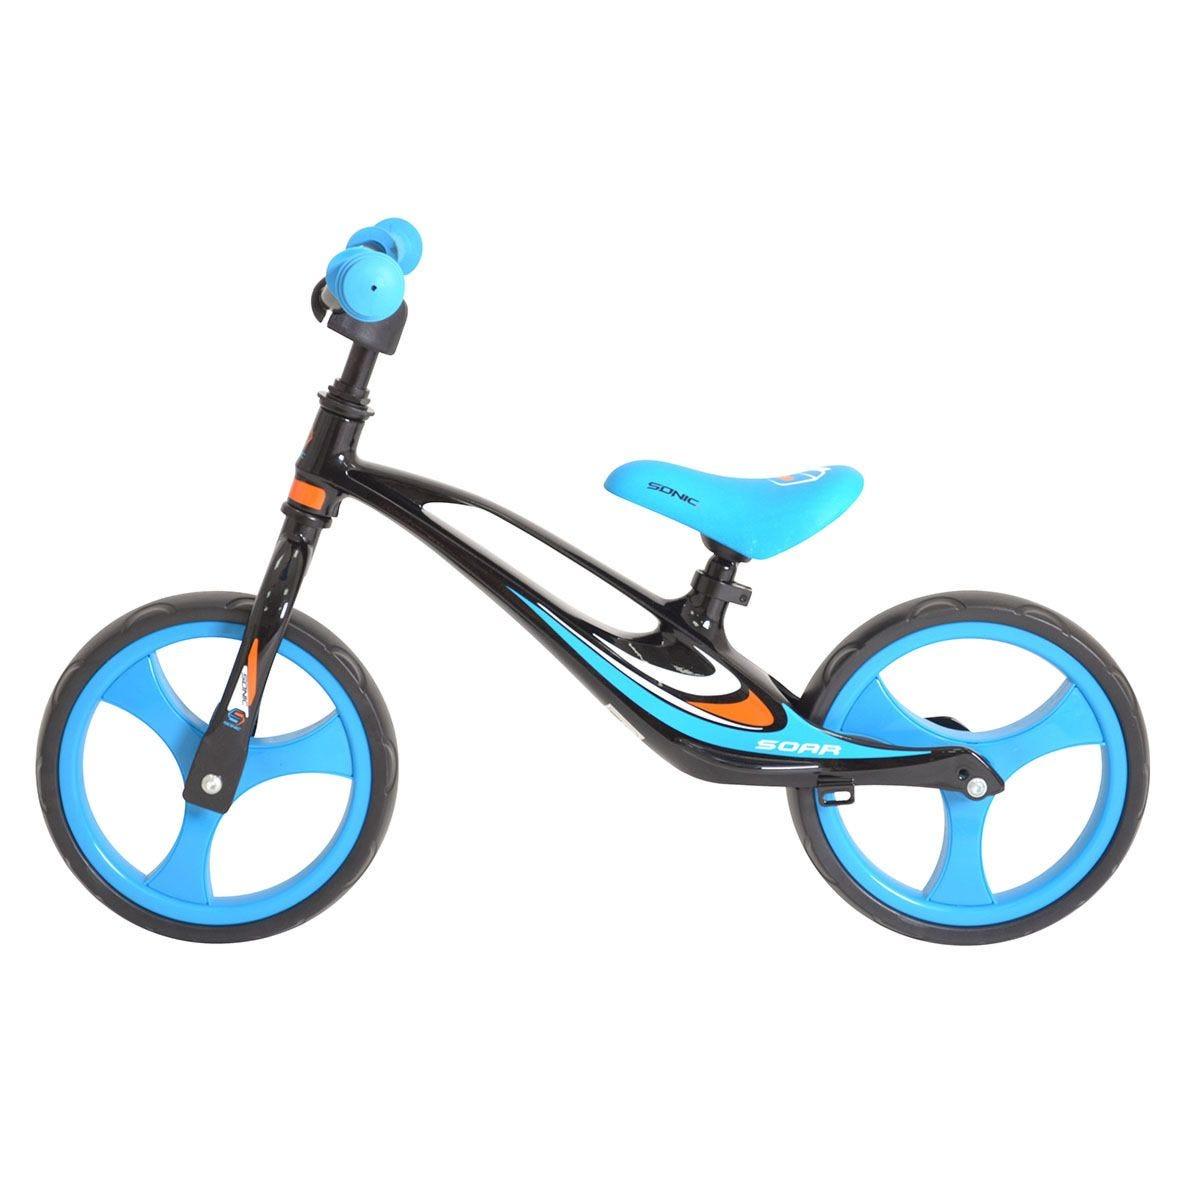 Sonic Soar Child Lightweight  Balance Bike with EVA Tyres - Black & Blue